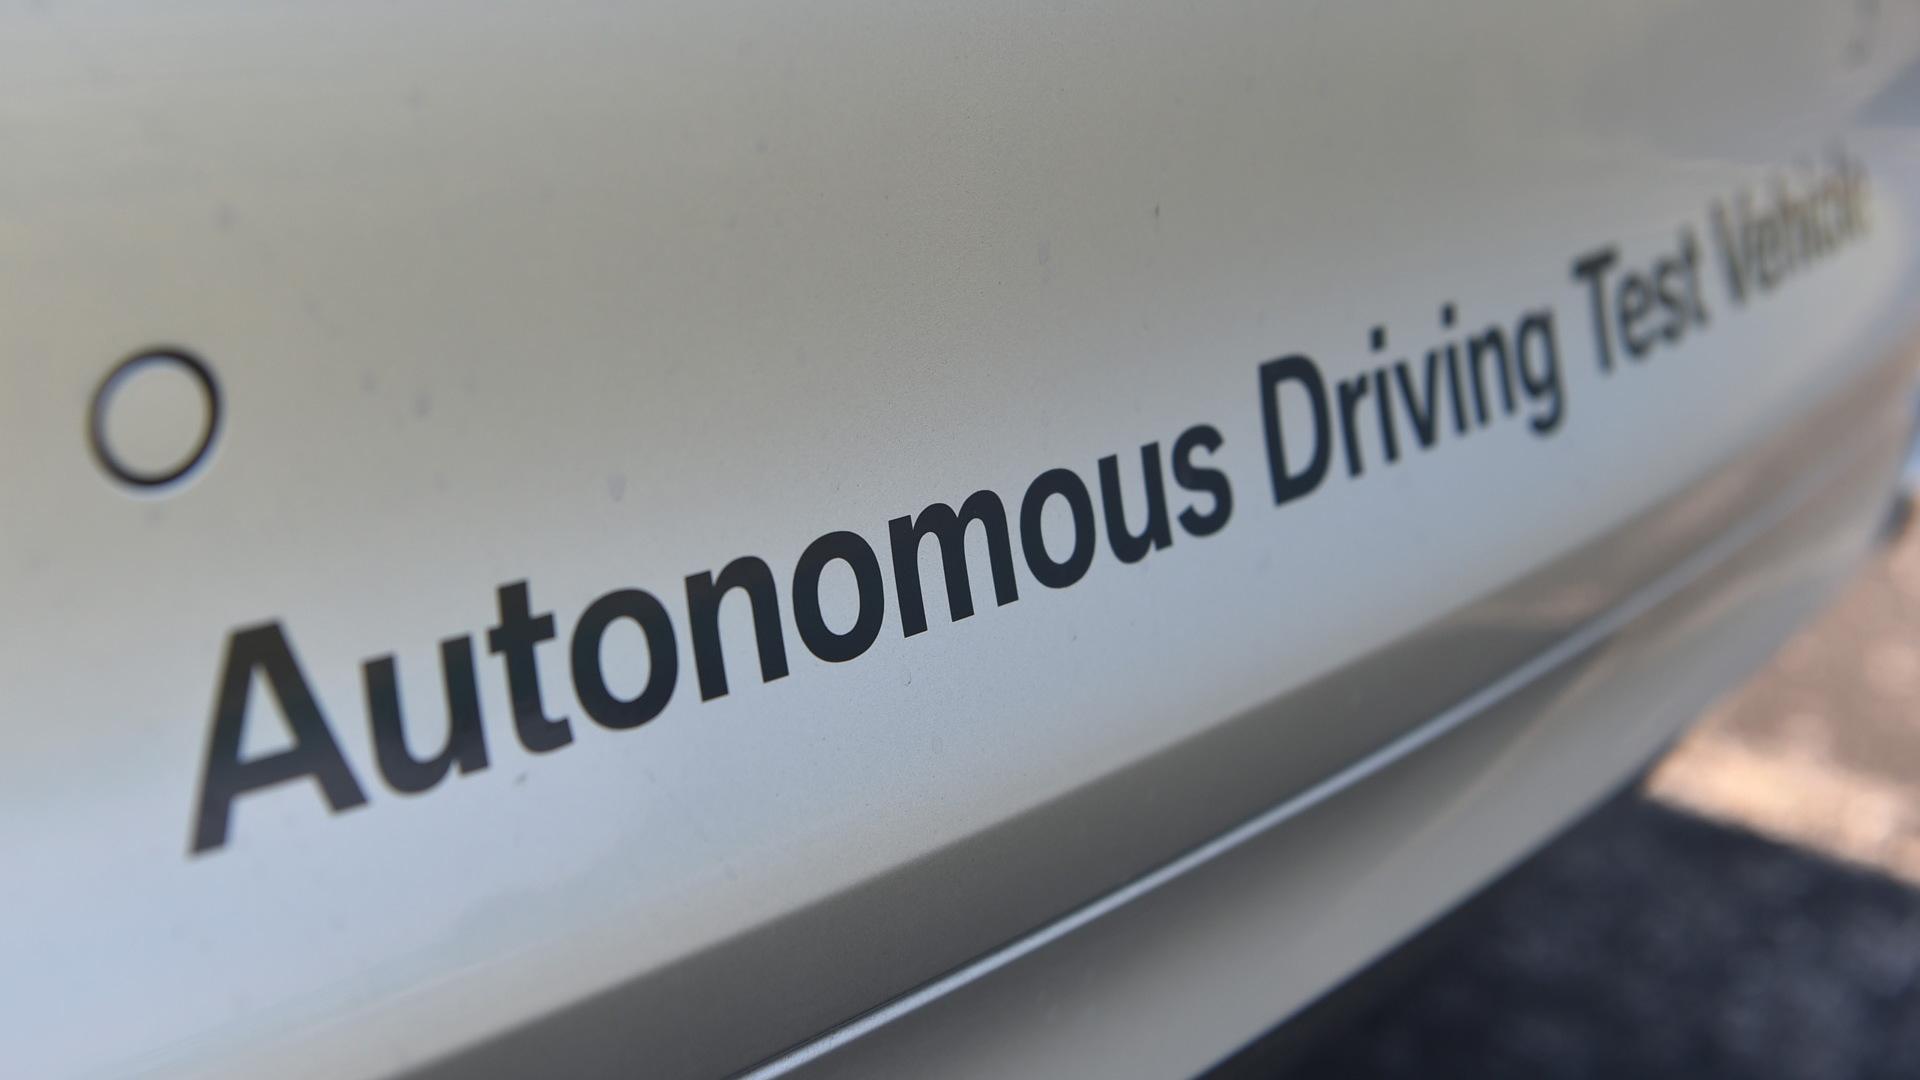 BMW self-driving car prototype